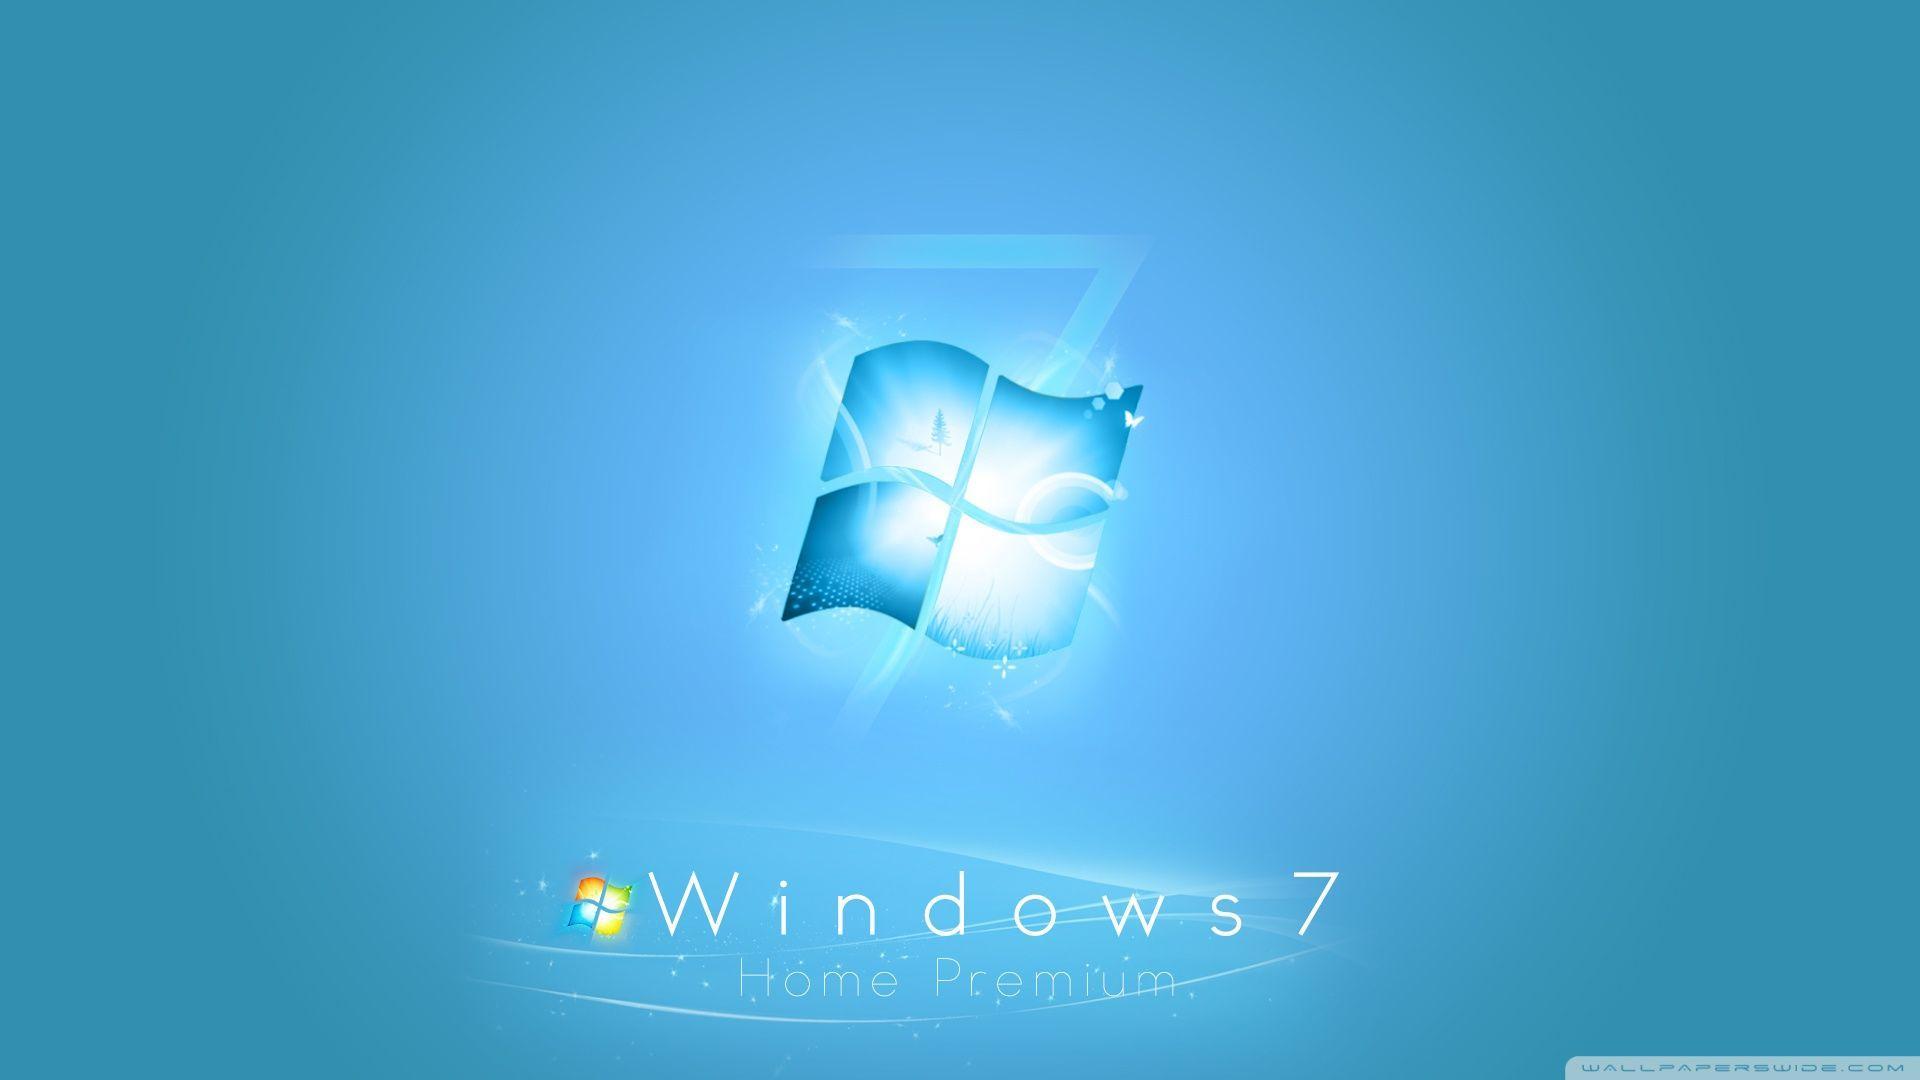 Windows 7 PC Wallpapers HD 1920x1080